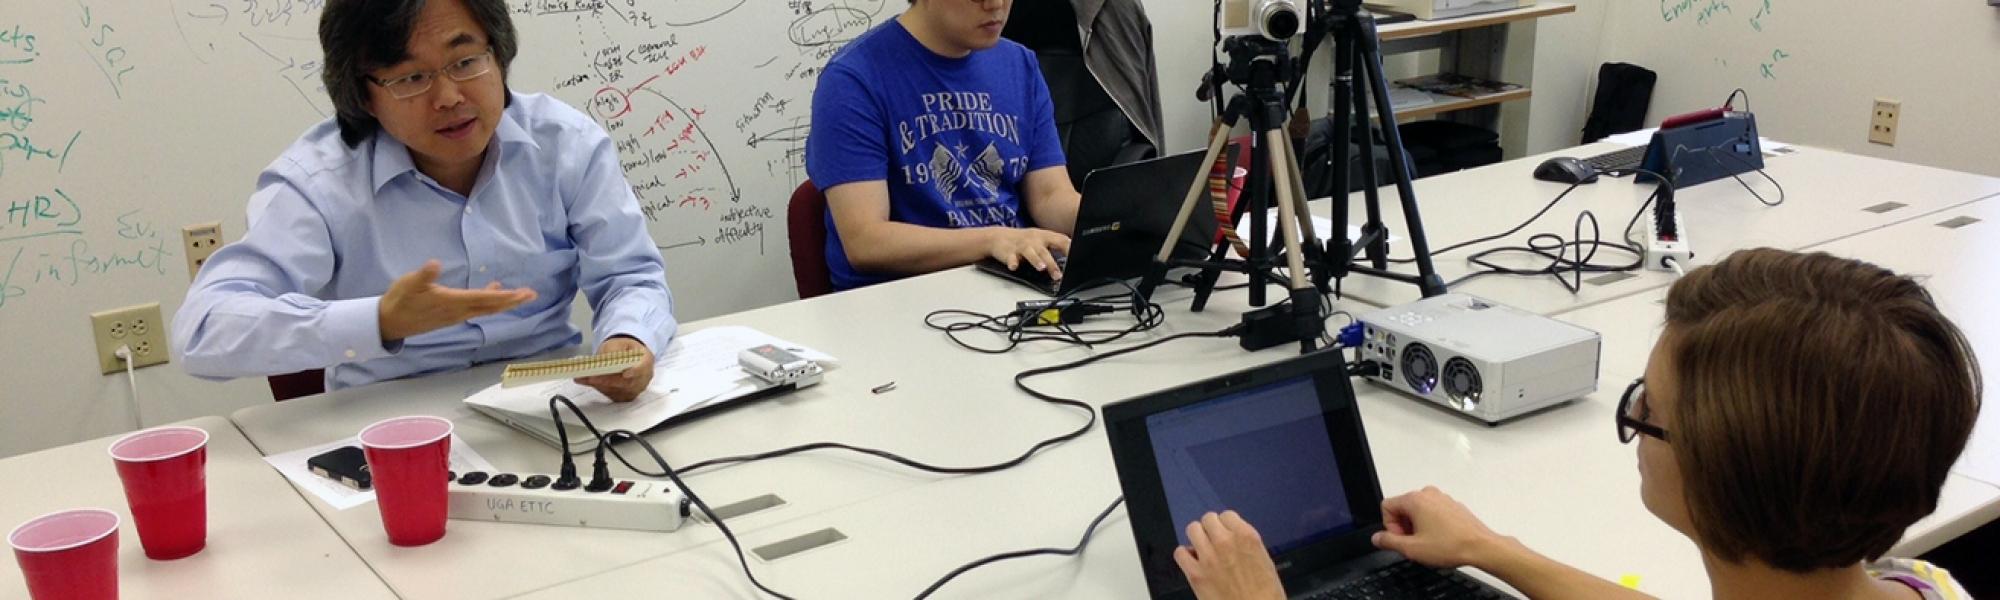 meeting_rail